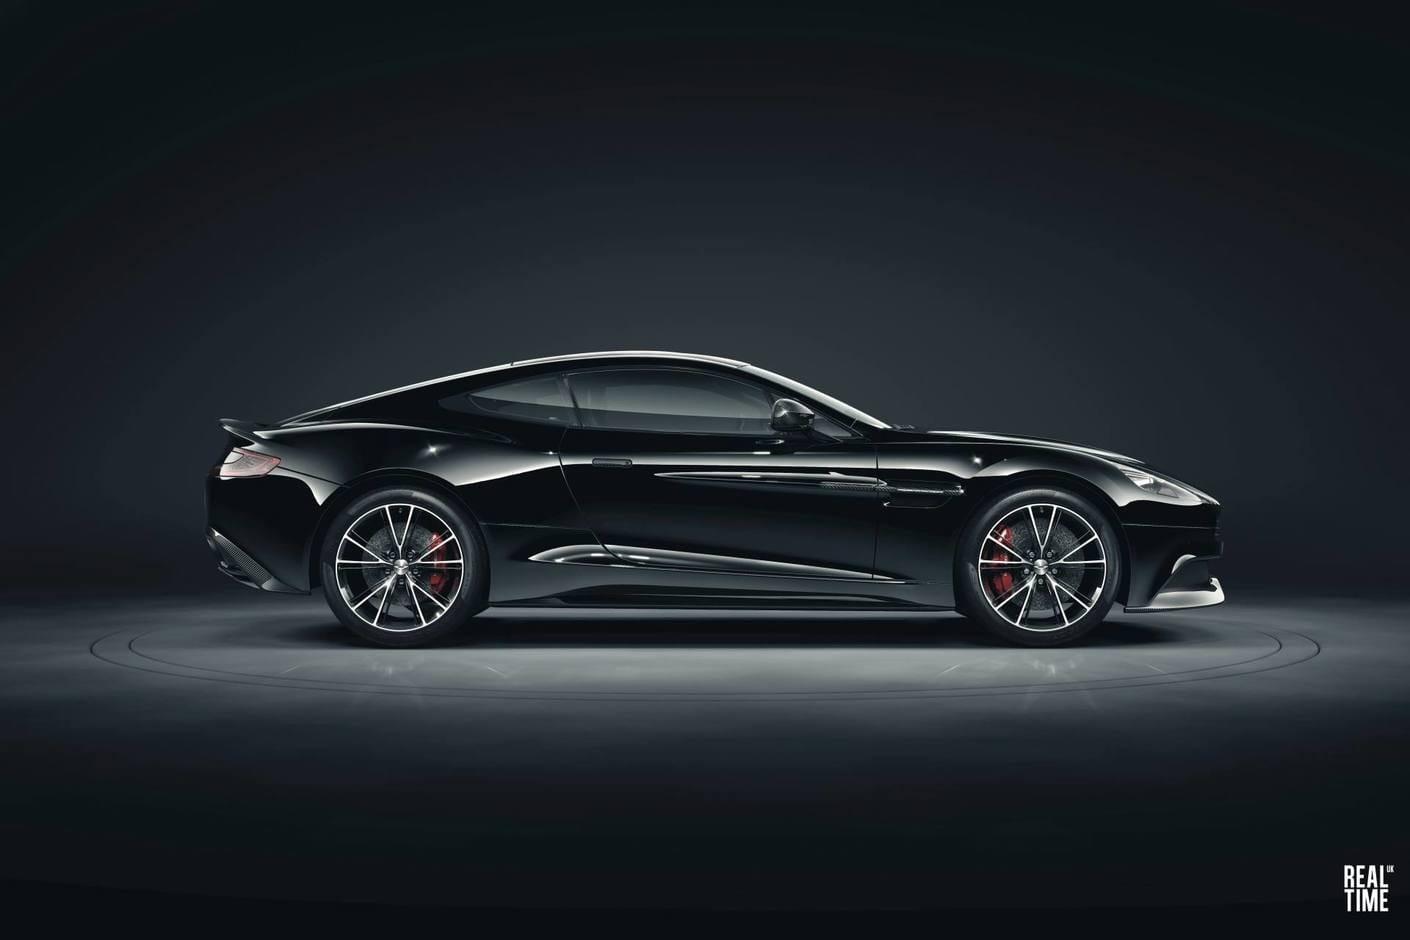 Aston Martin Vanquish Realtimeuk Chaos Group